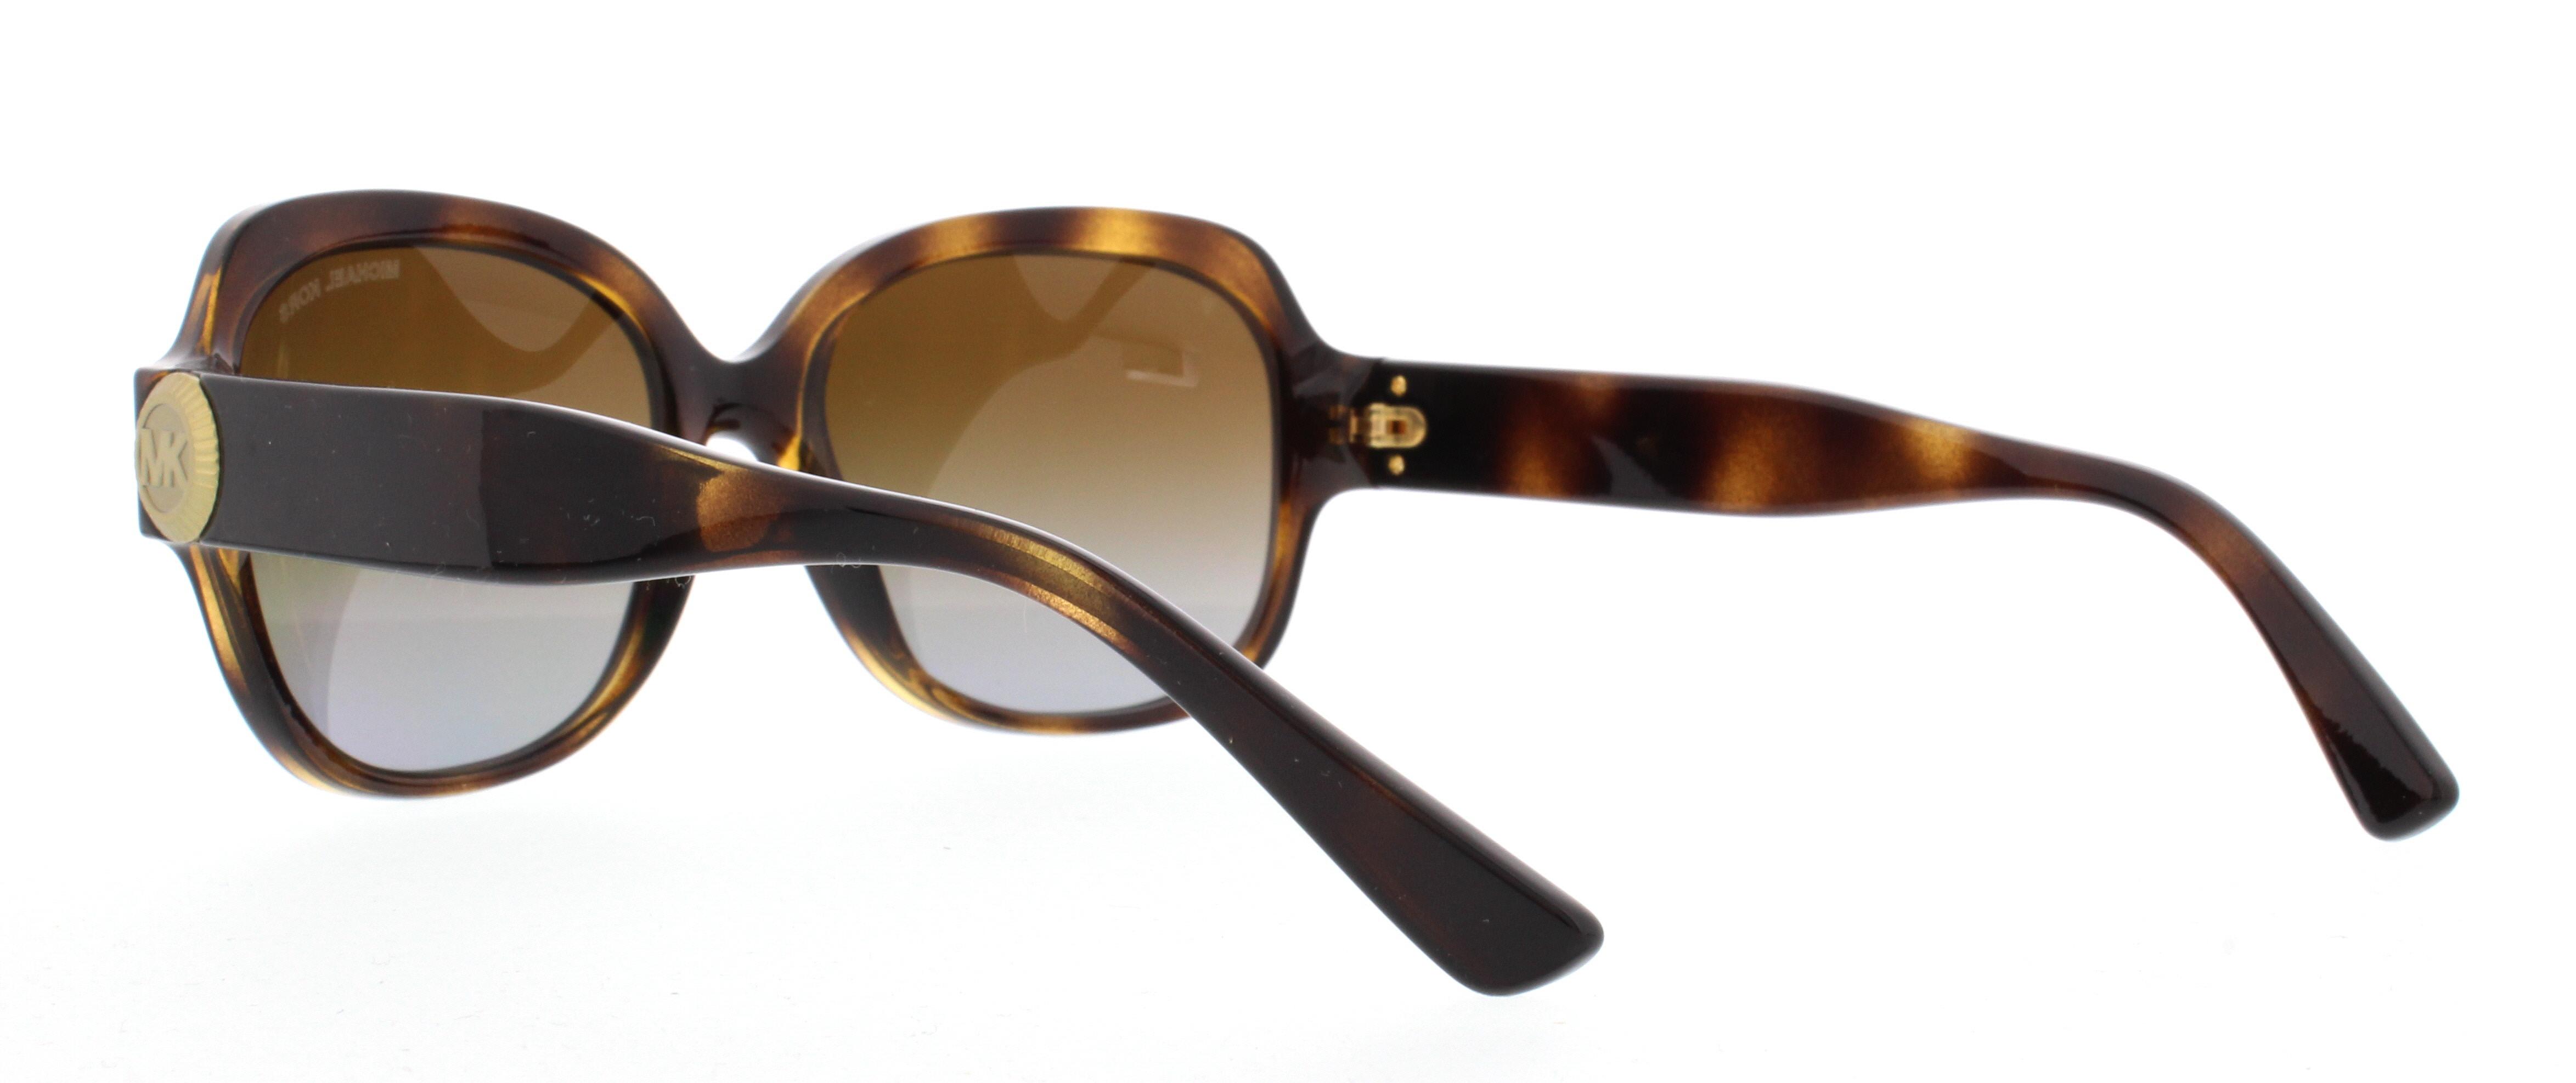 36f0619cb647 Designer Frames Outlet. Michael Kors MK2055